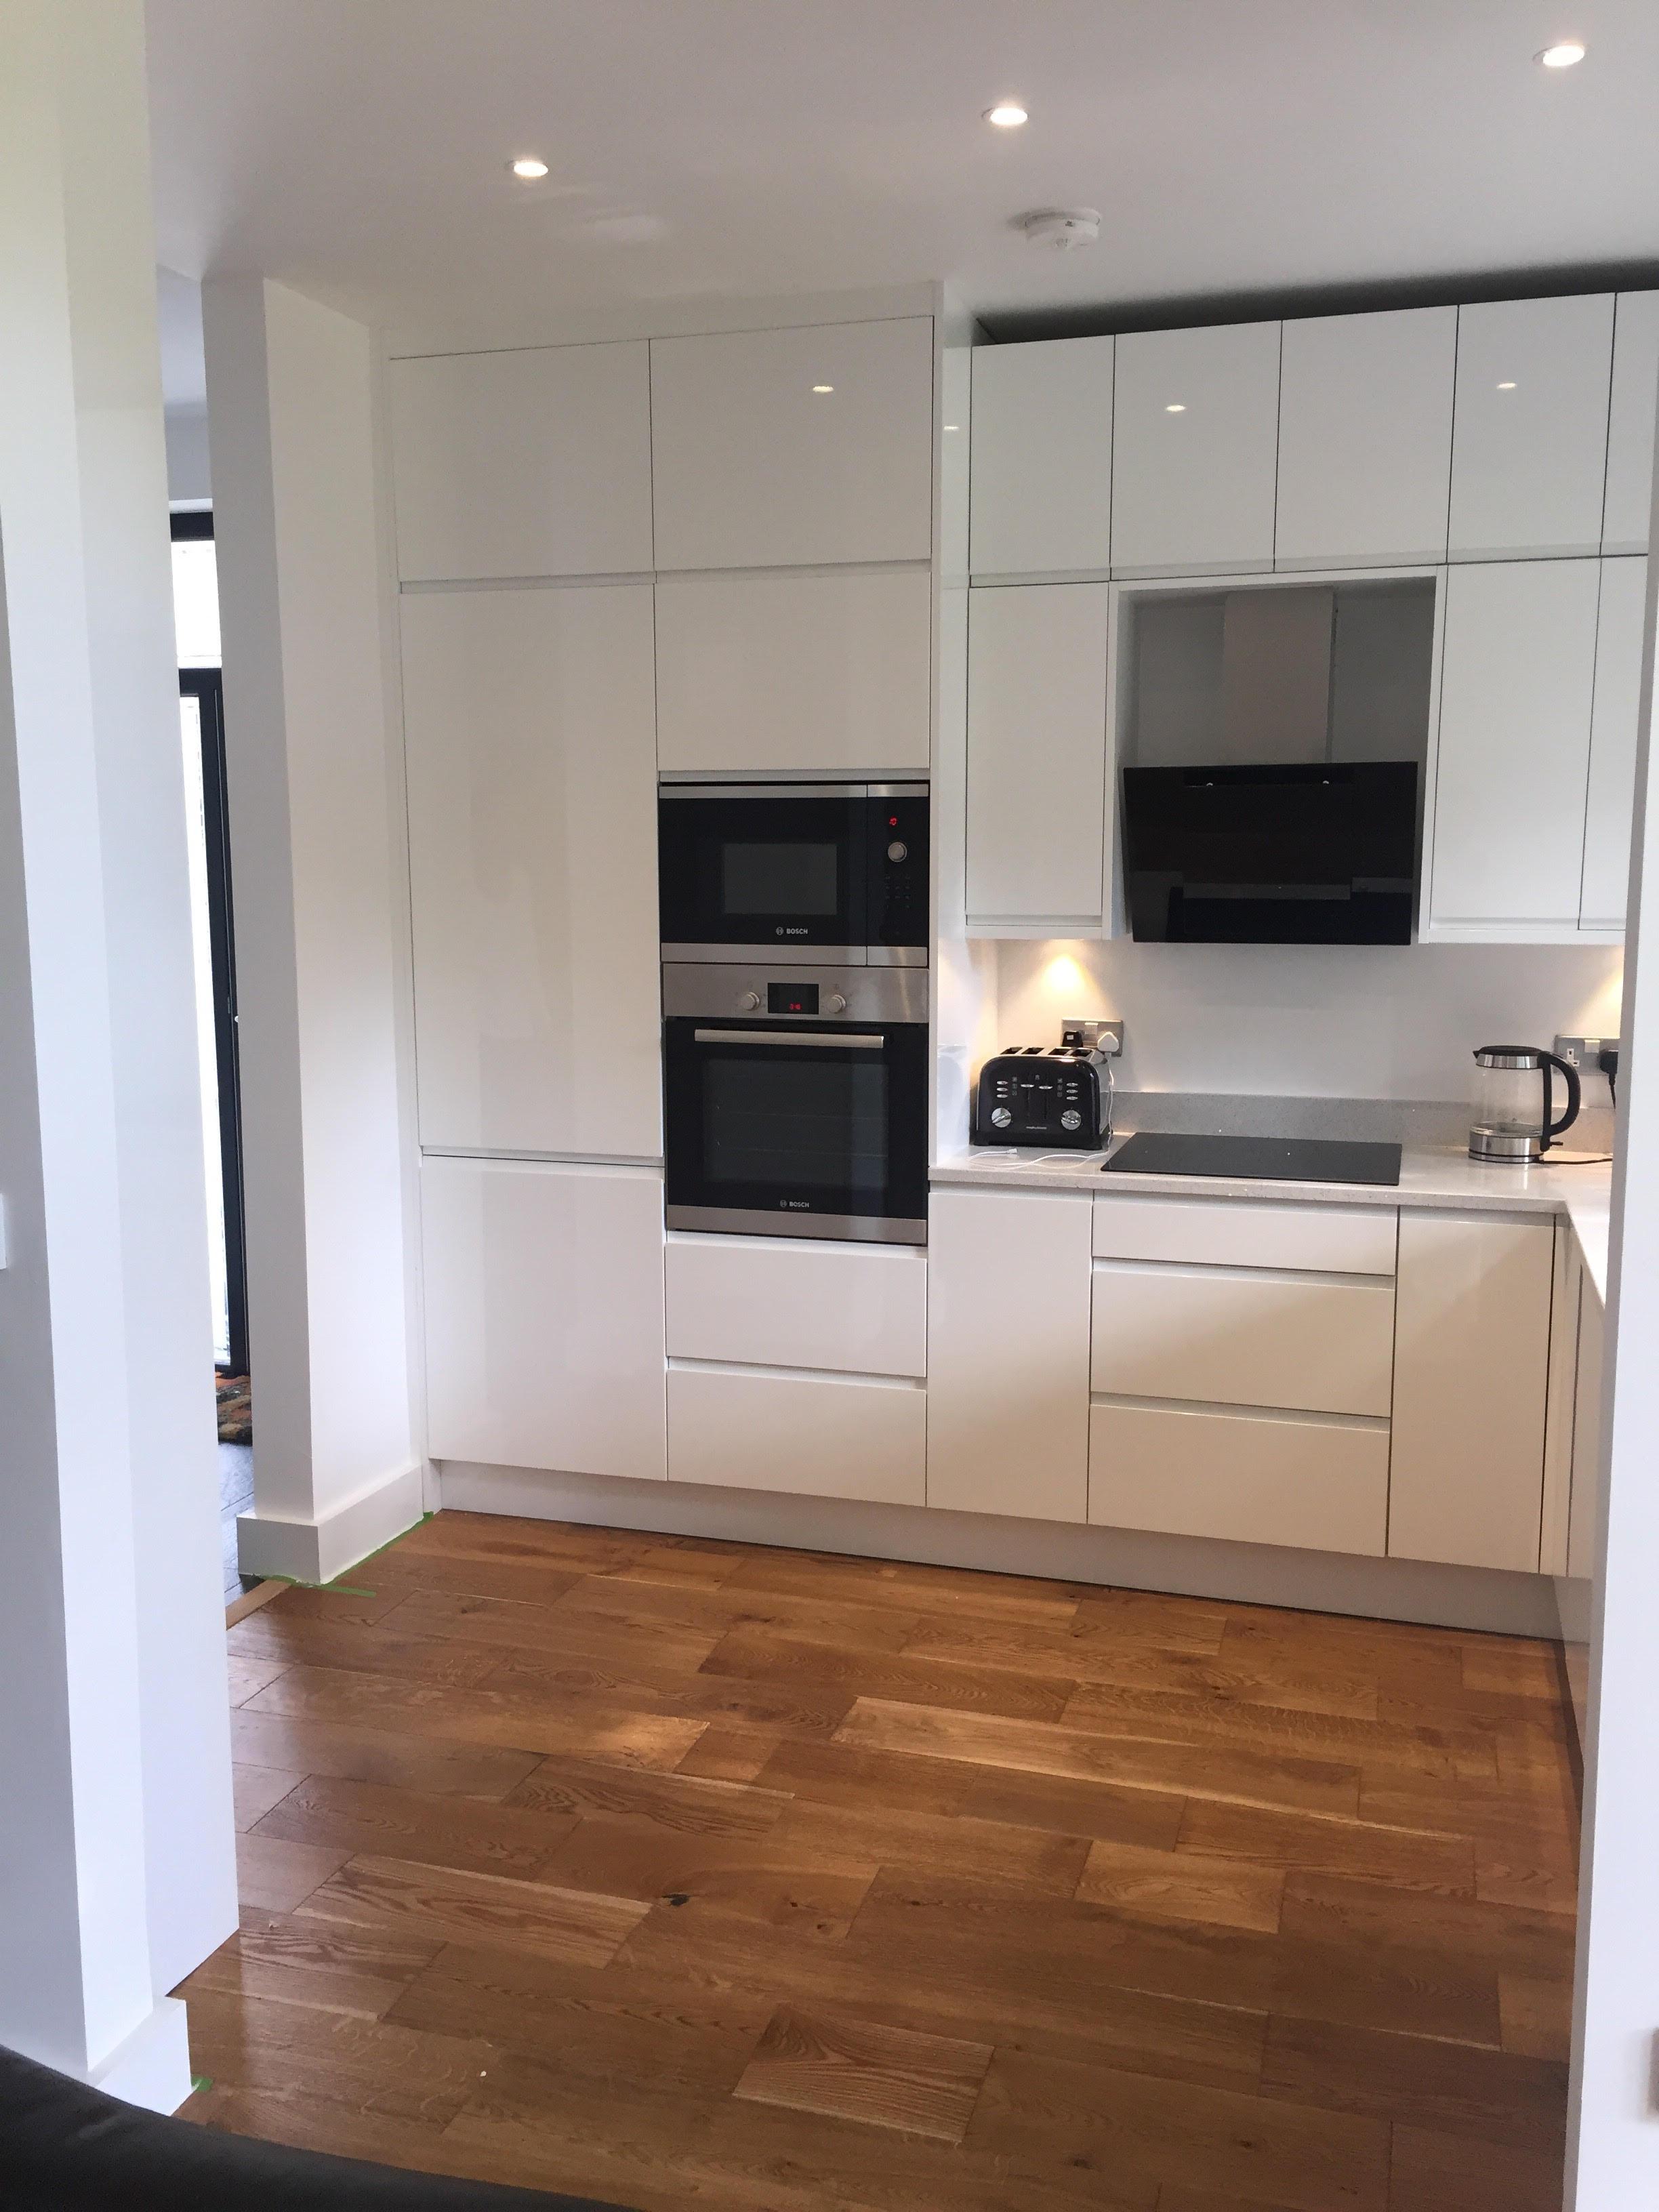 Kitchen Fitting in House Refurb Bingley west yorkshire